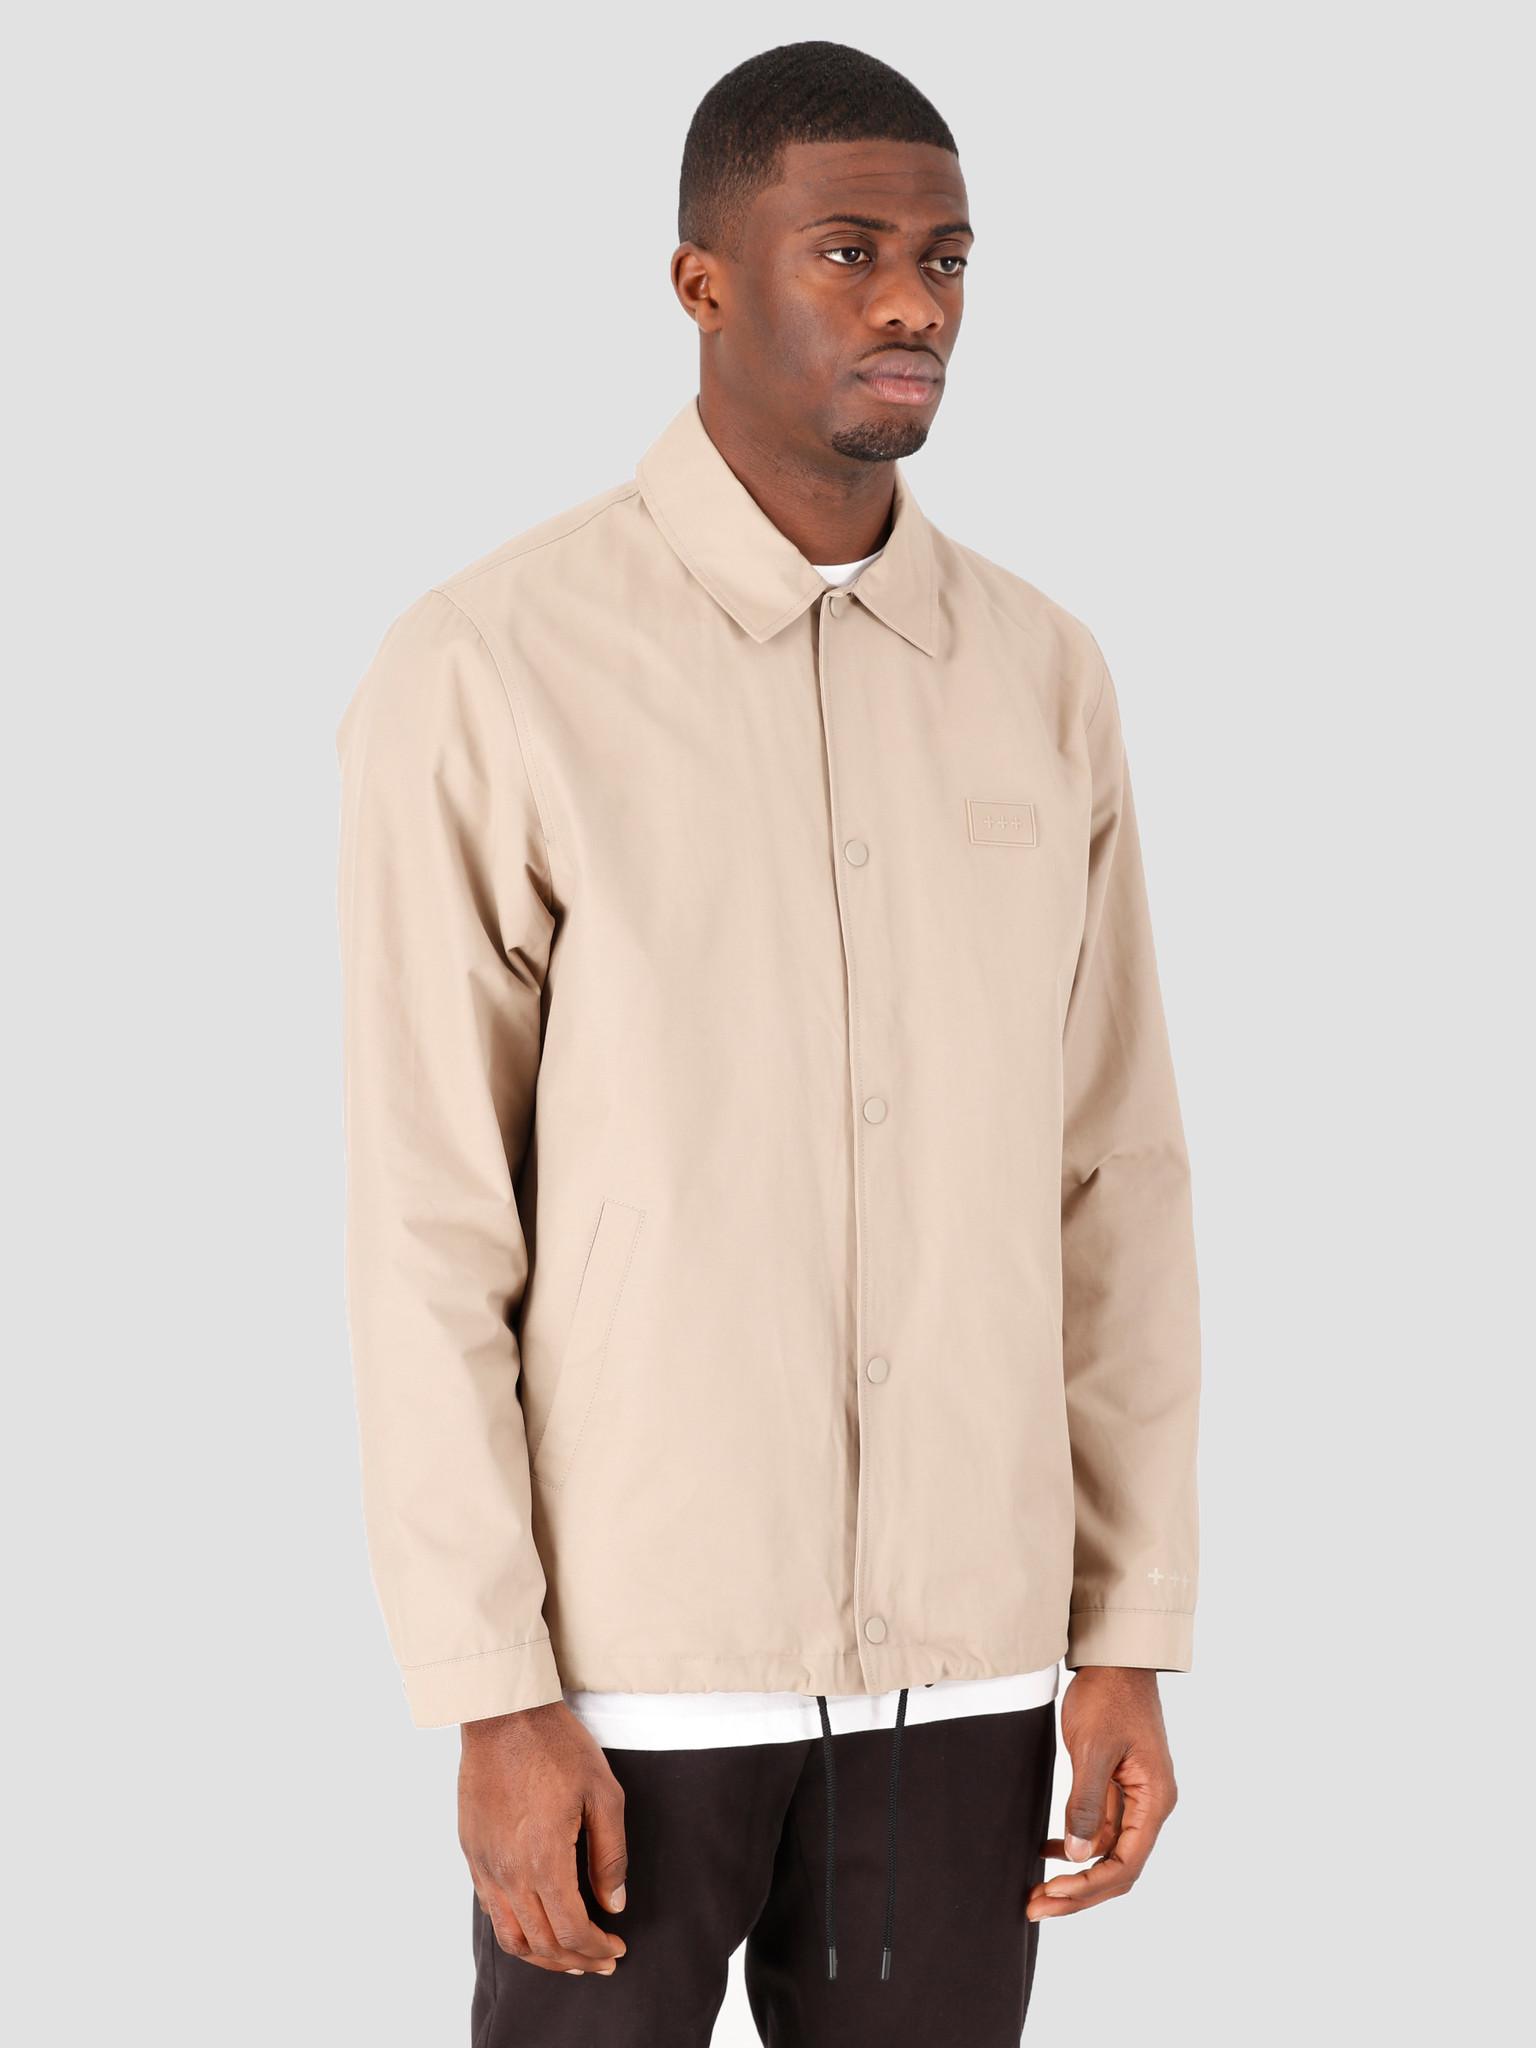 Quality Blanks Quality Blanks QB28 Coach Jacket Sand